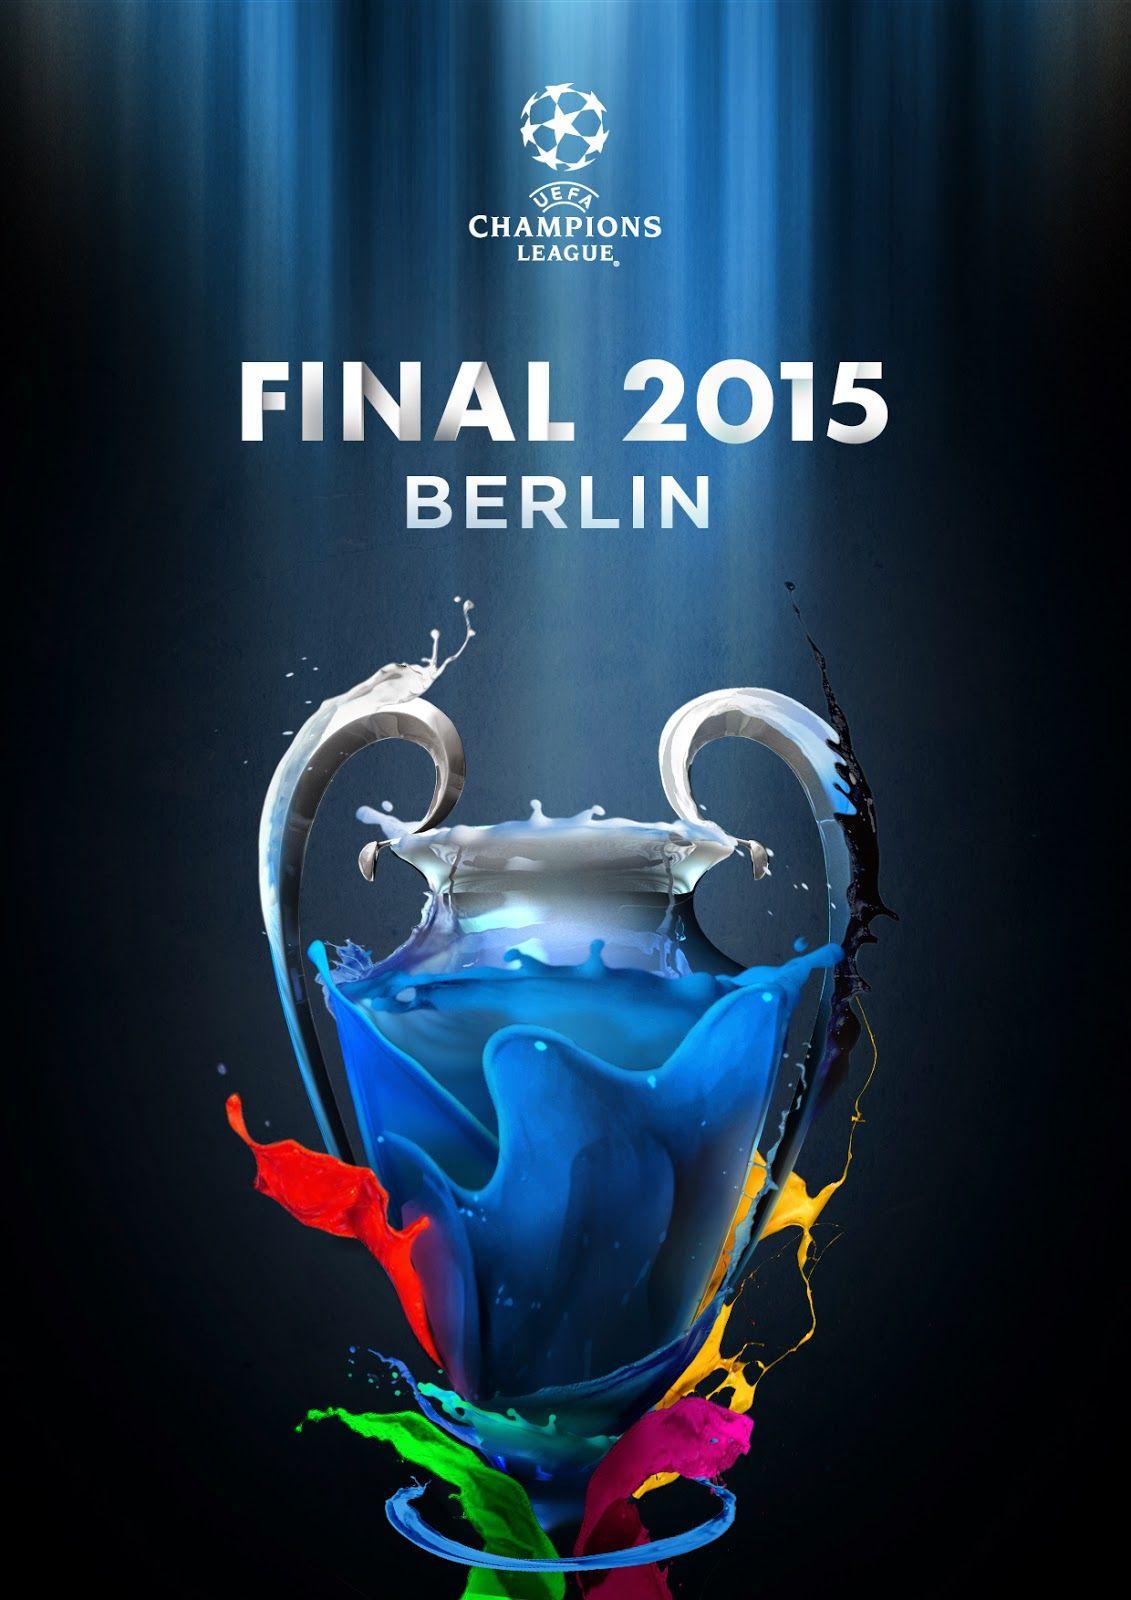 Champions League News, Scores, Schedule, Standings ... - MSN